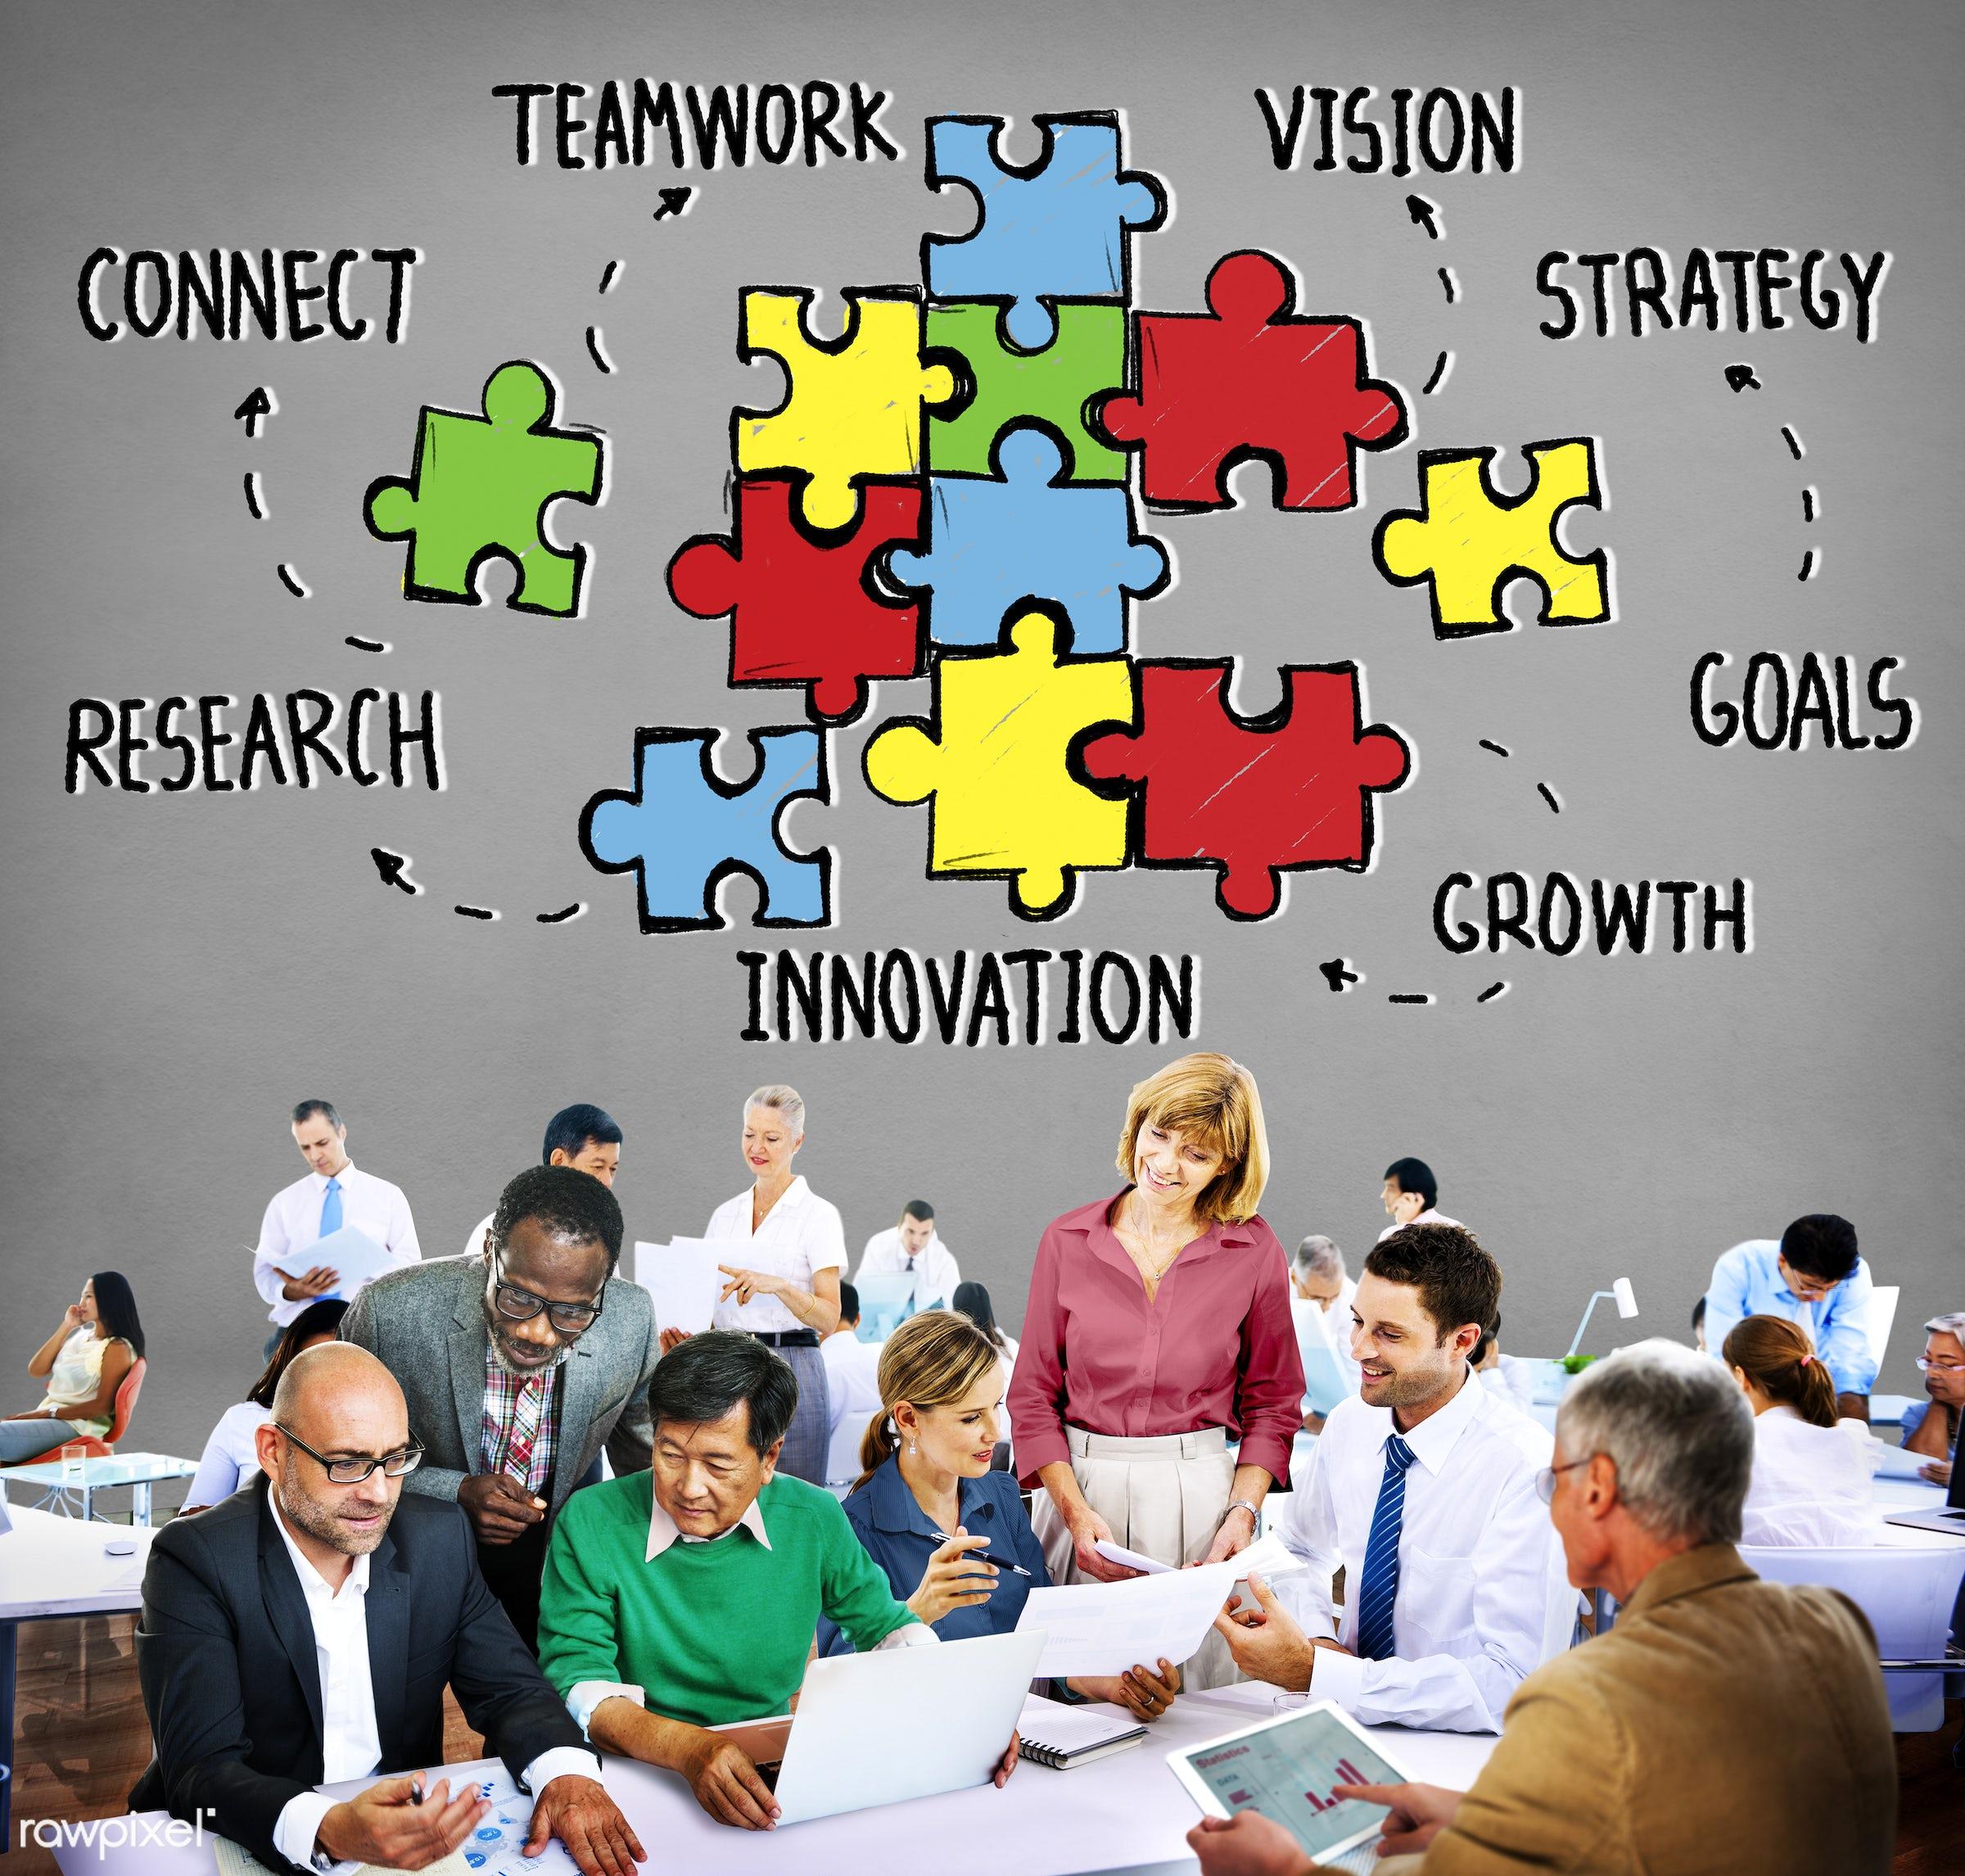 achievement, analysis, business, business people, businessmen, businesswomen, busy, collaboration, communication, community...